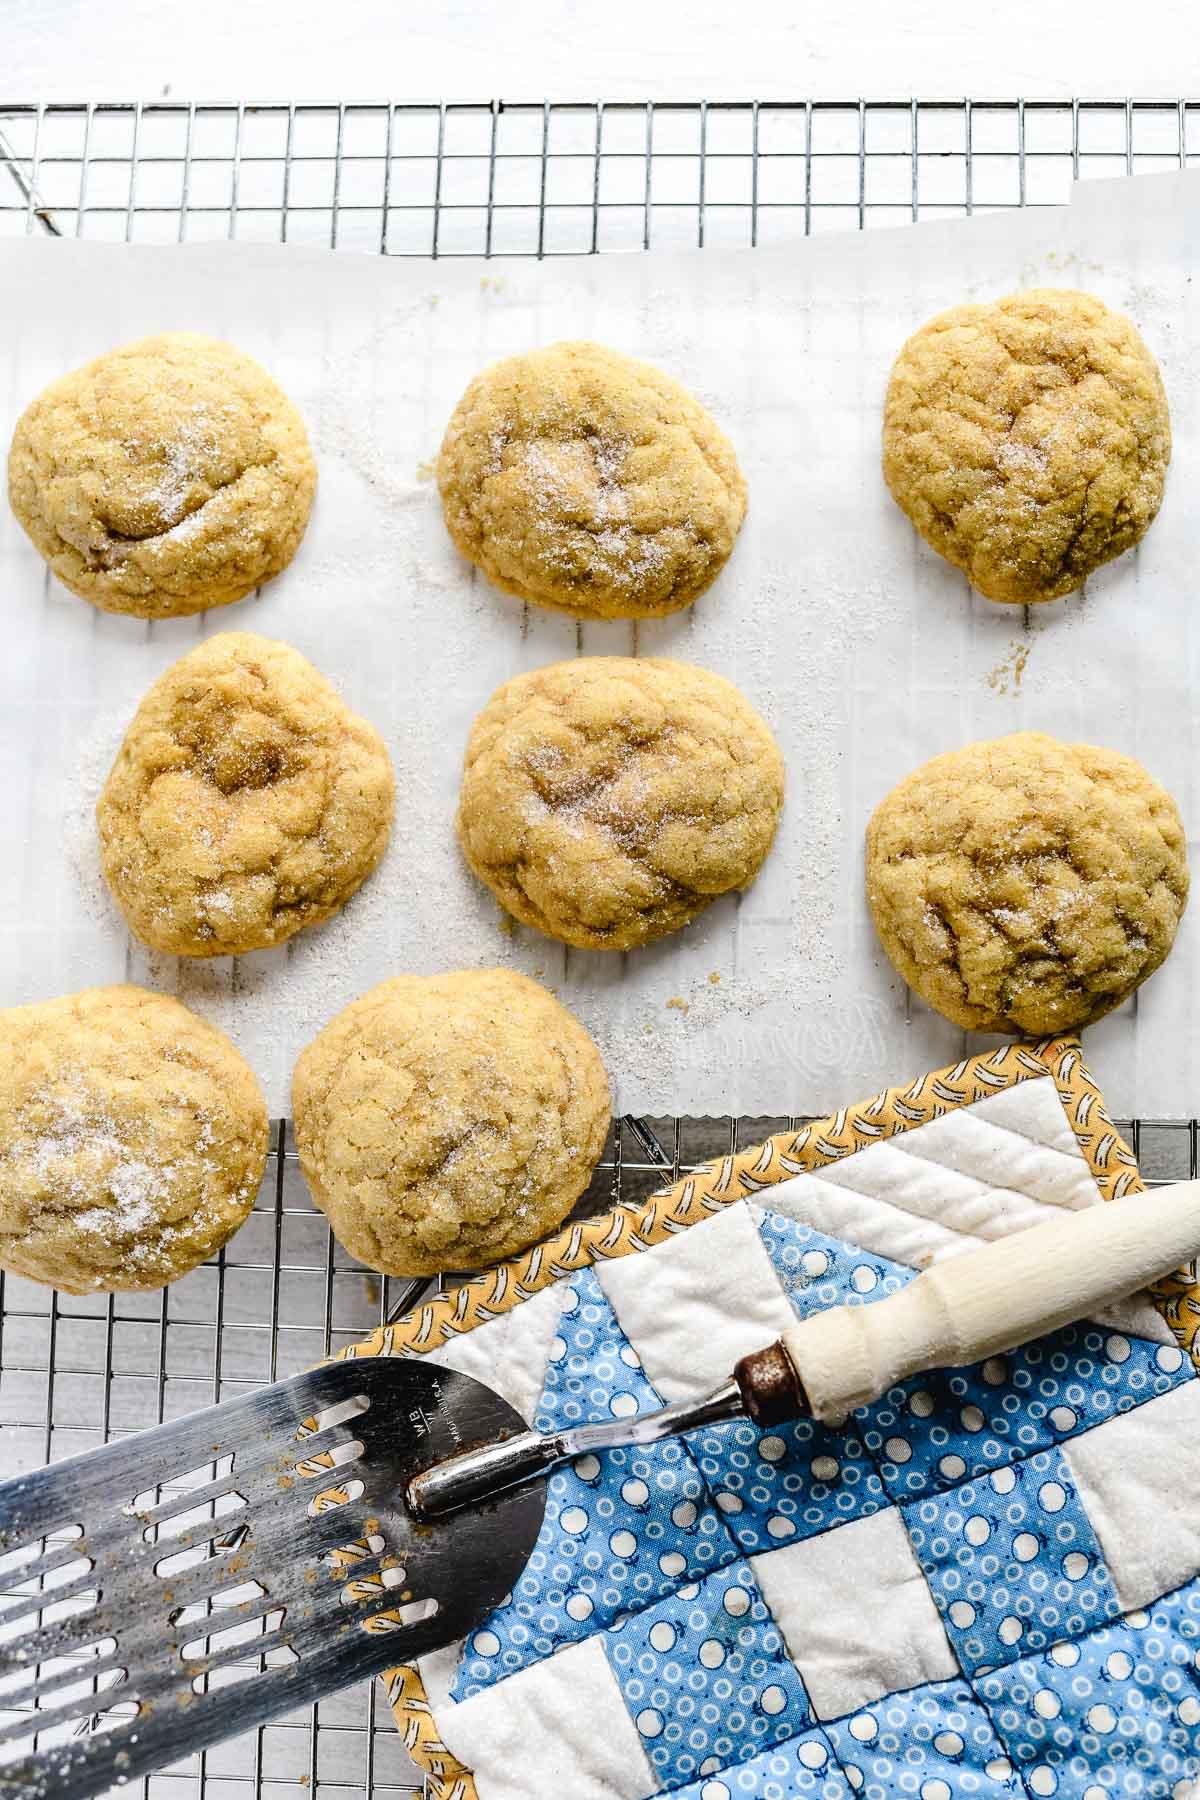 Pumpkin cookies cooling on a rack